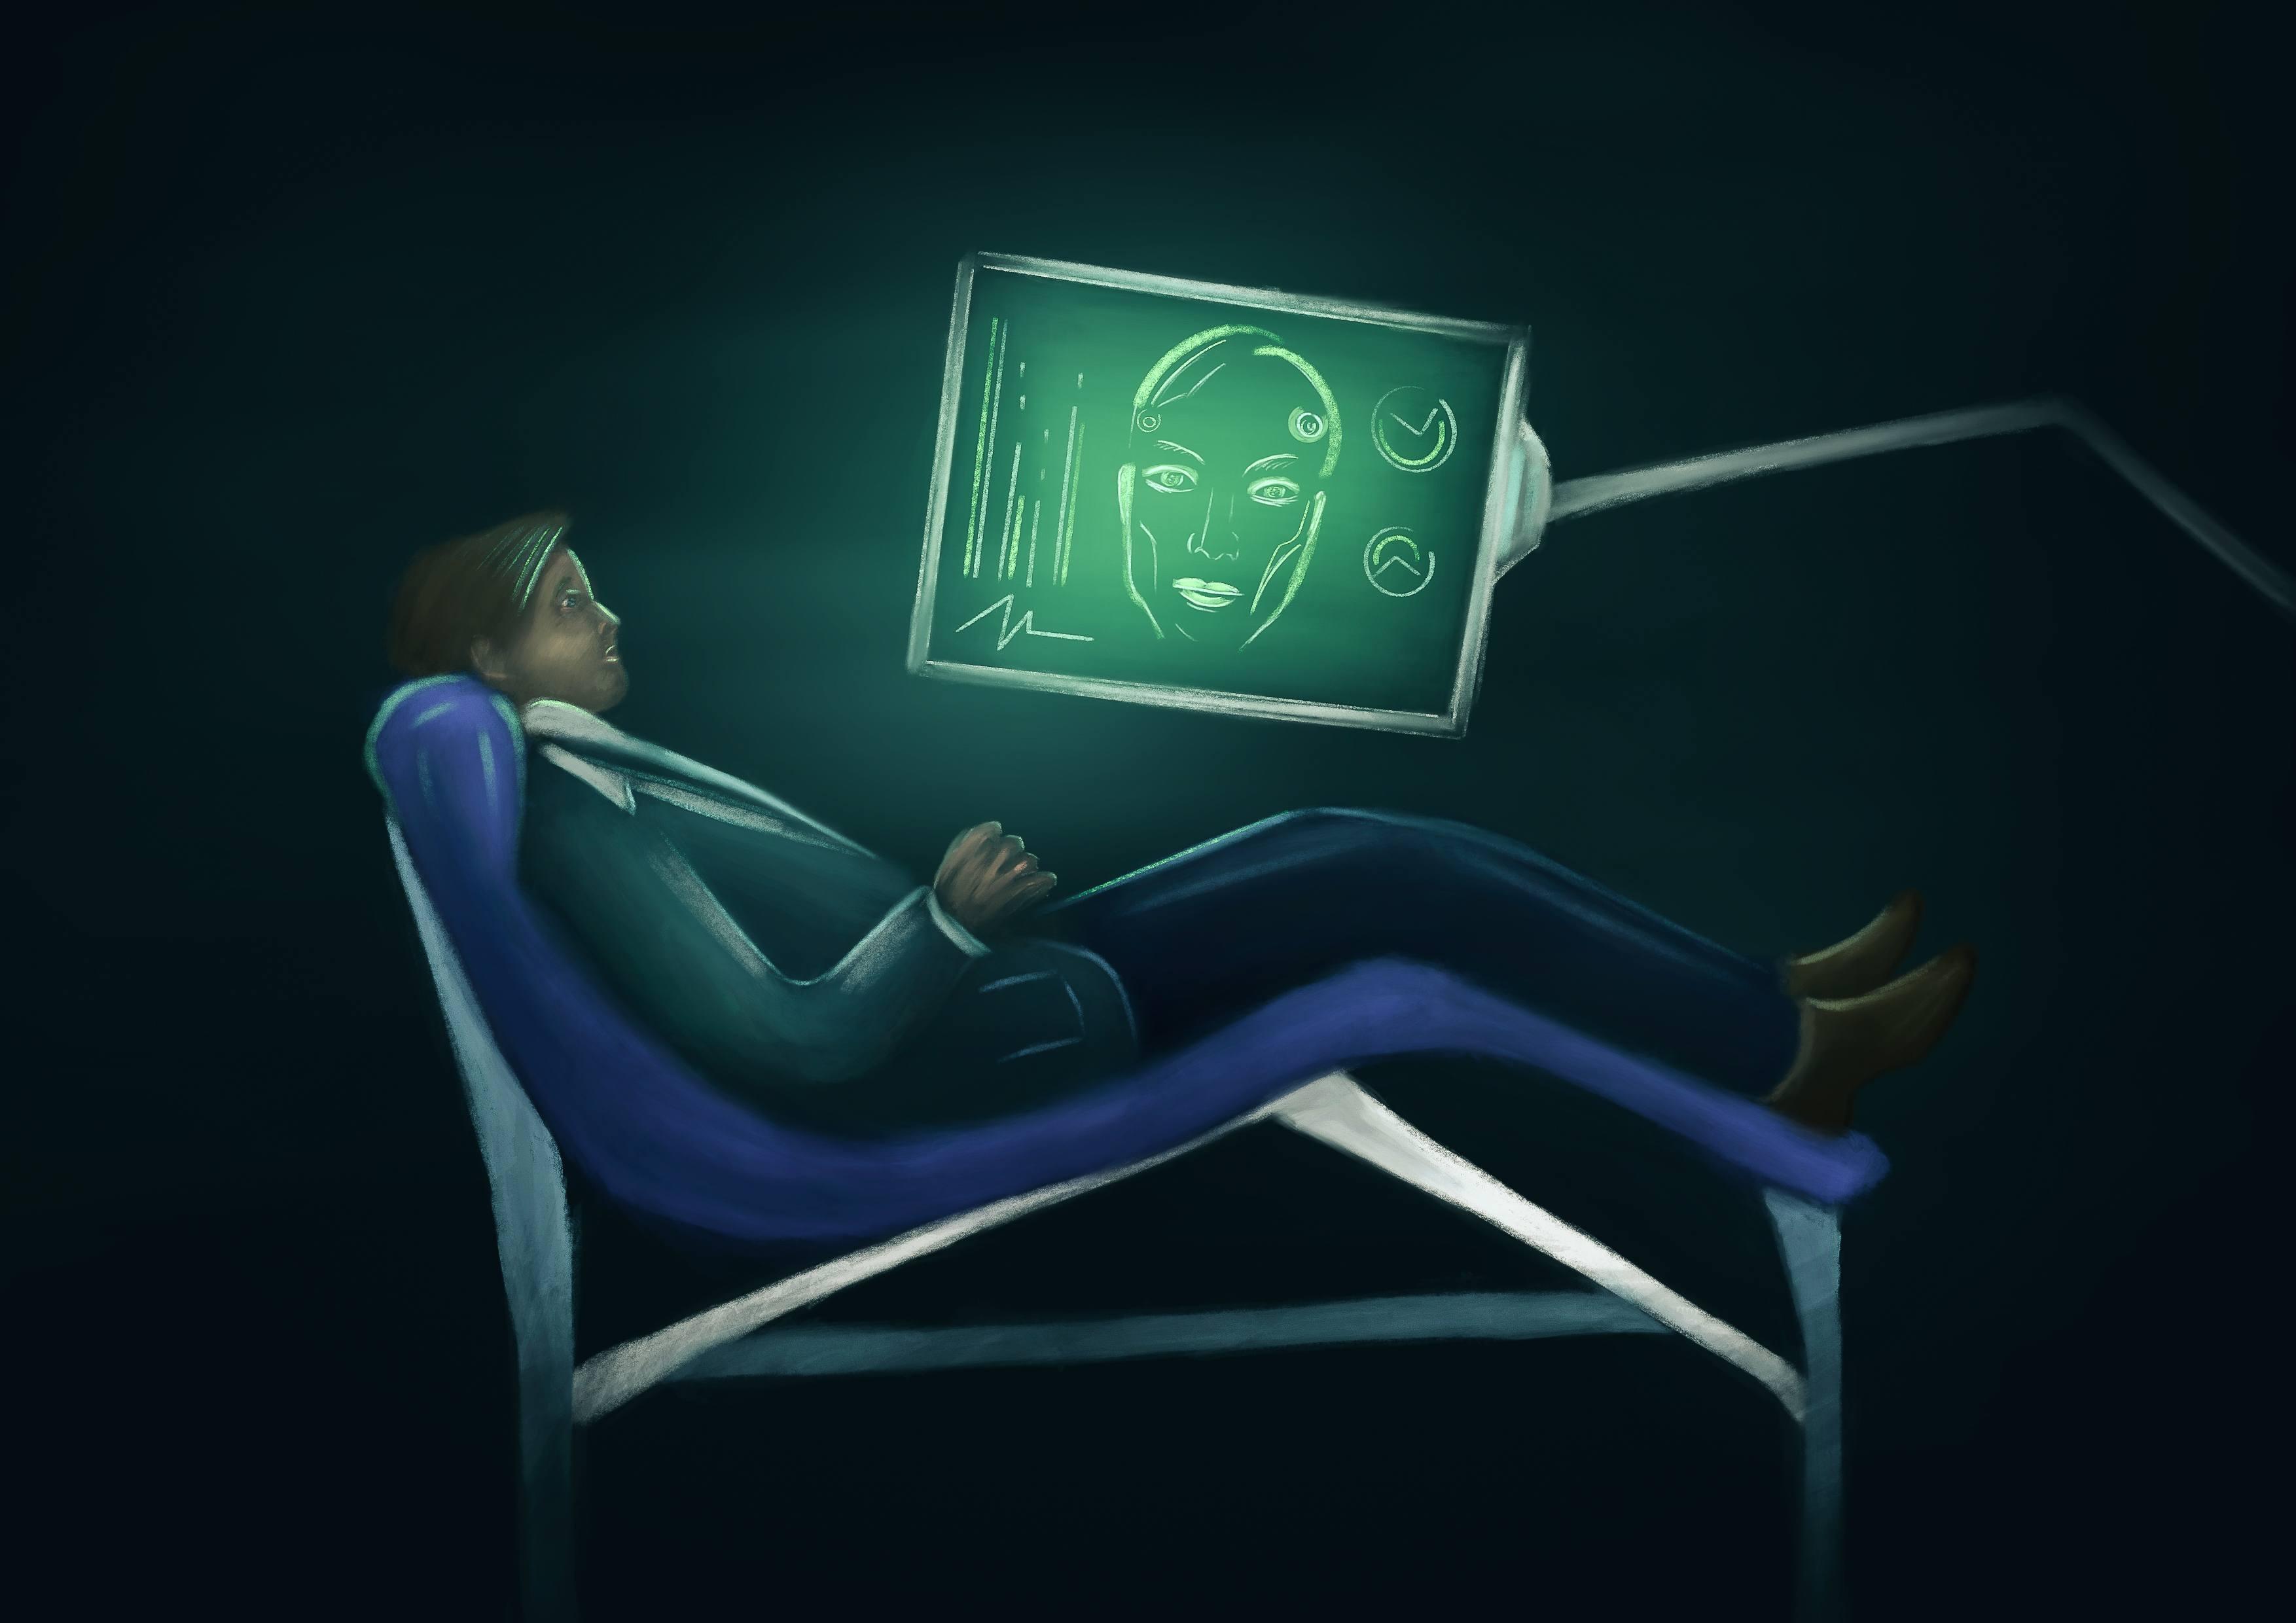 What Will Happen In 2050